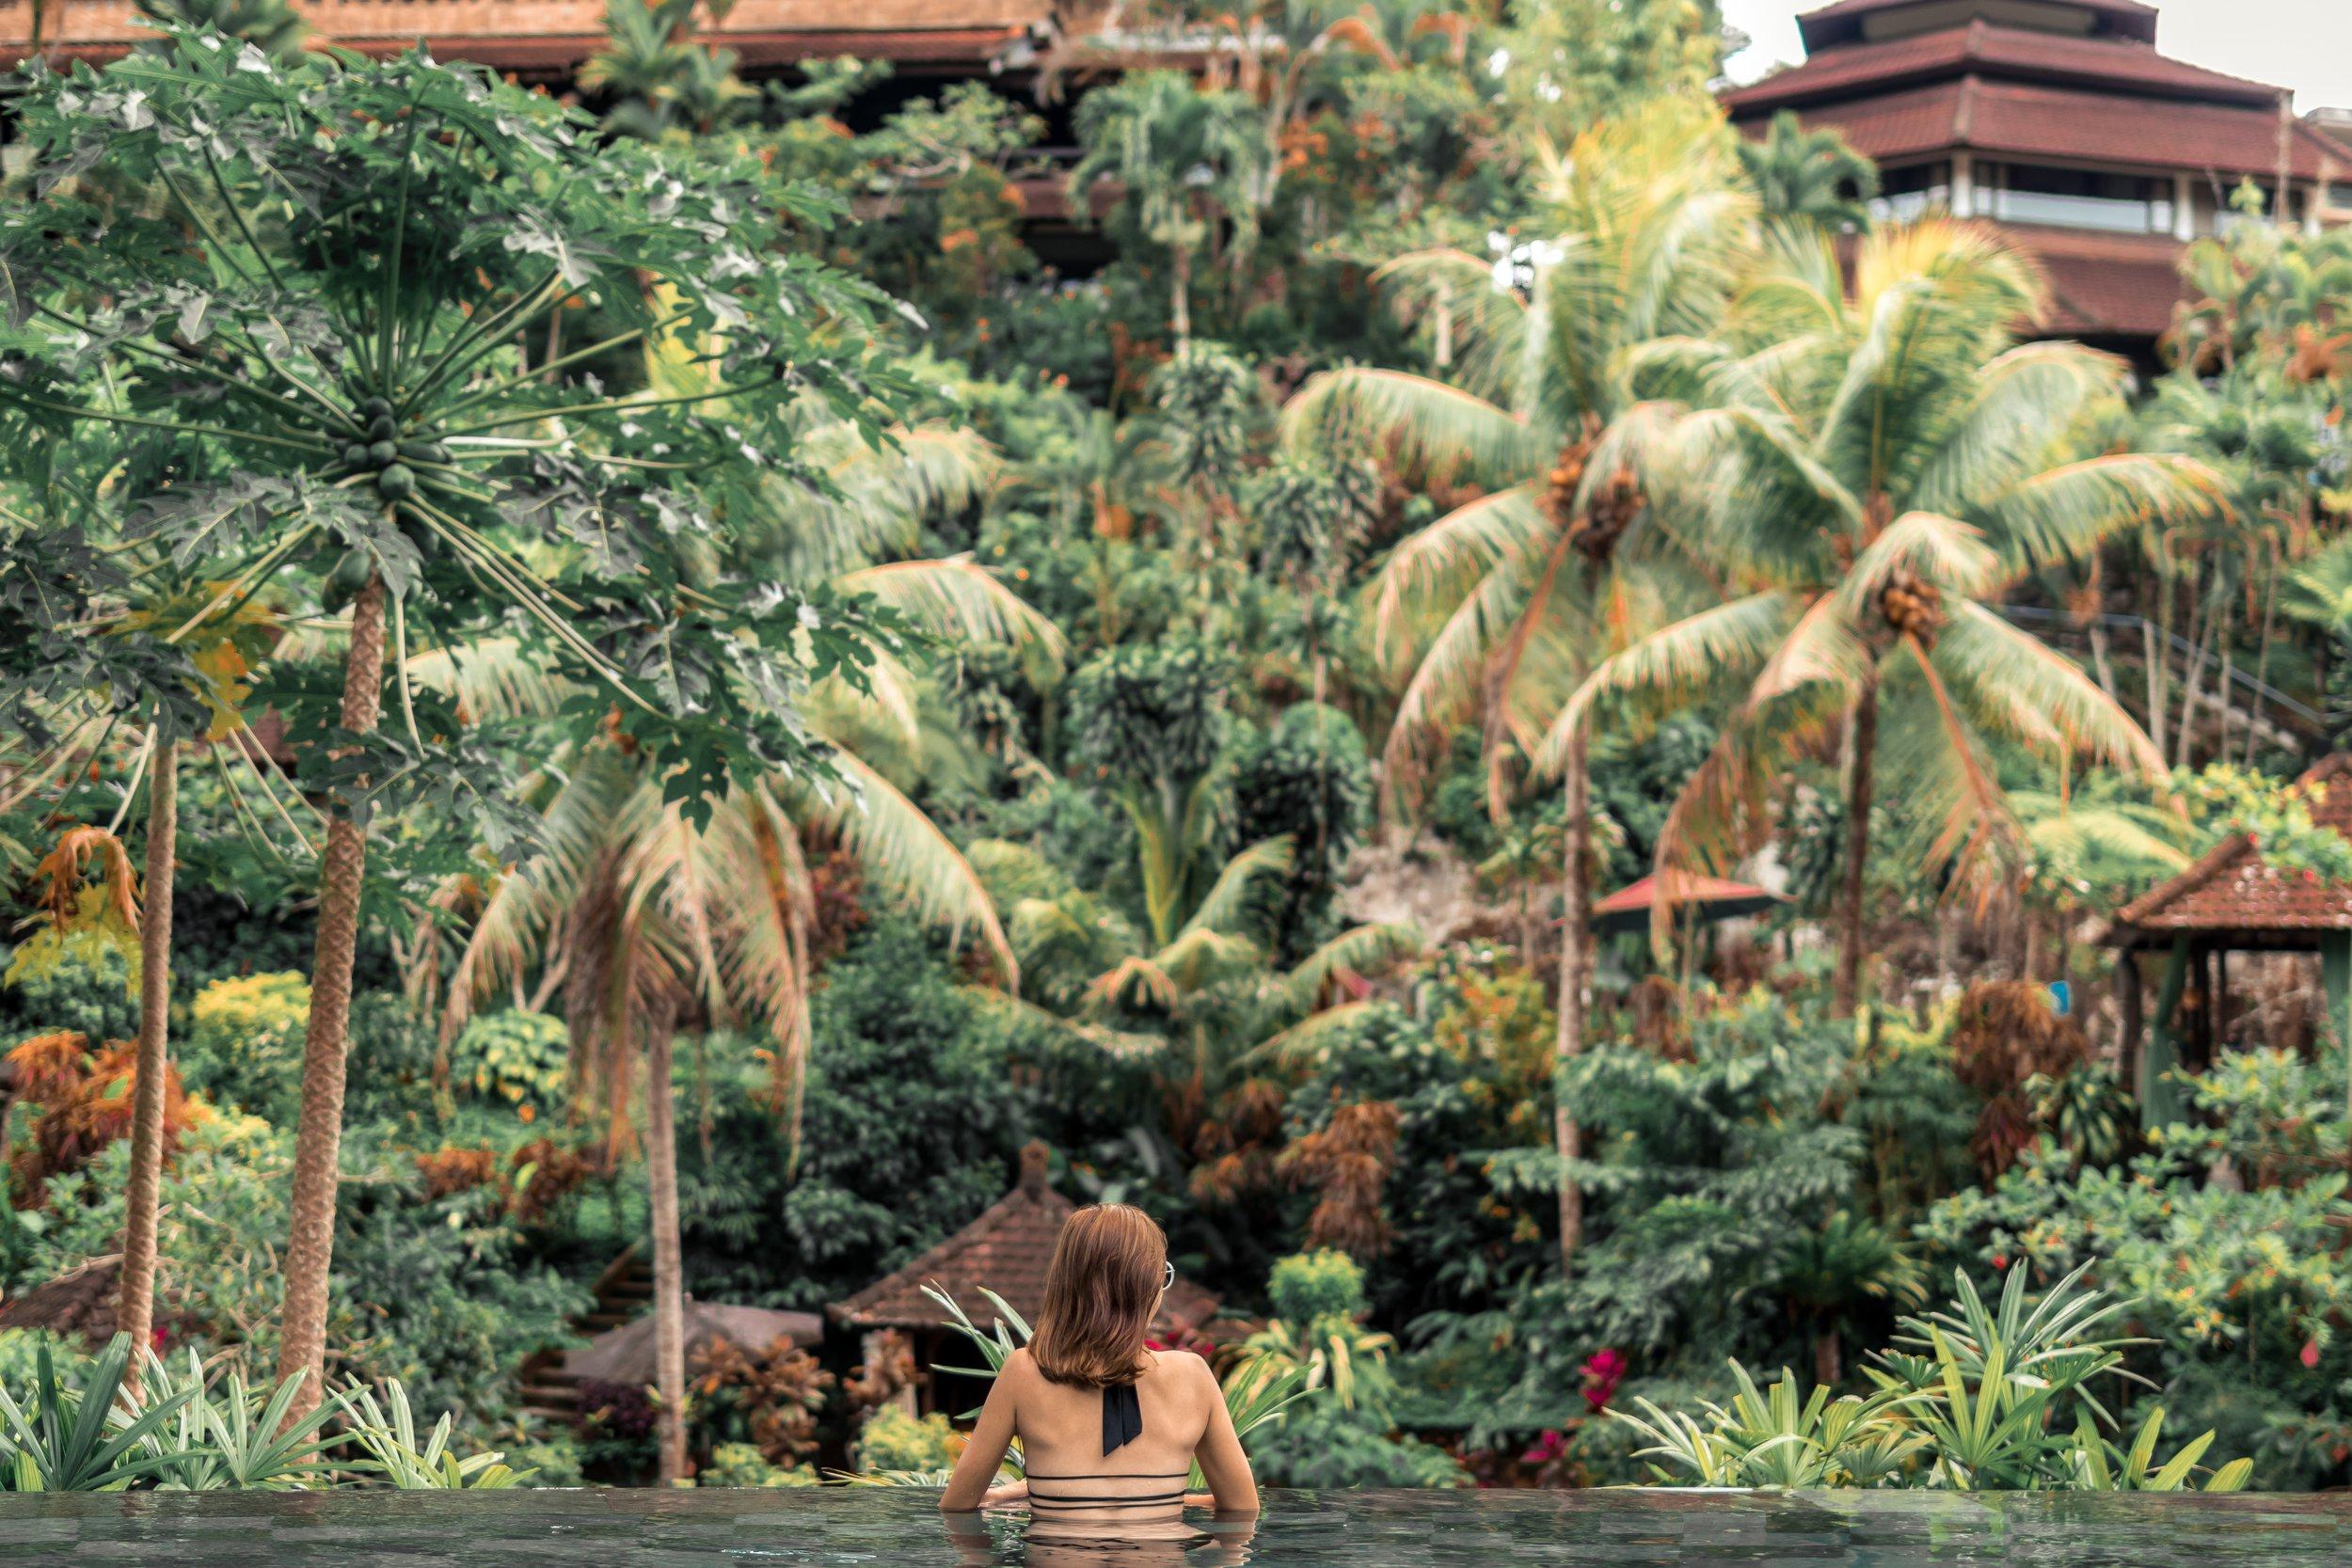 back-view-coconut-trees-daylight-1051732.jpg